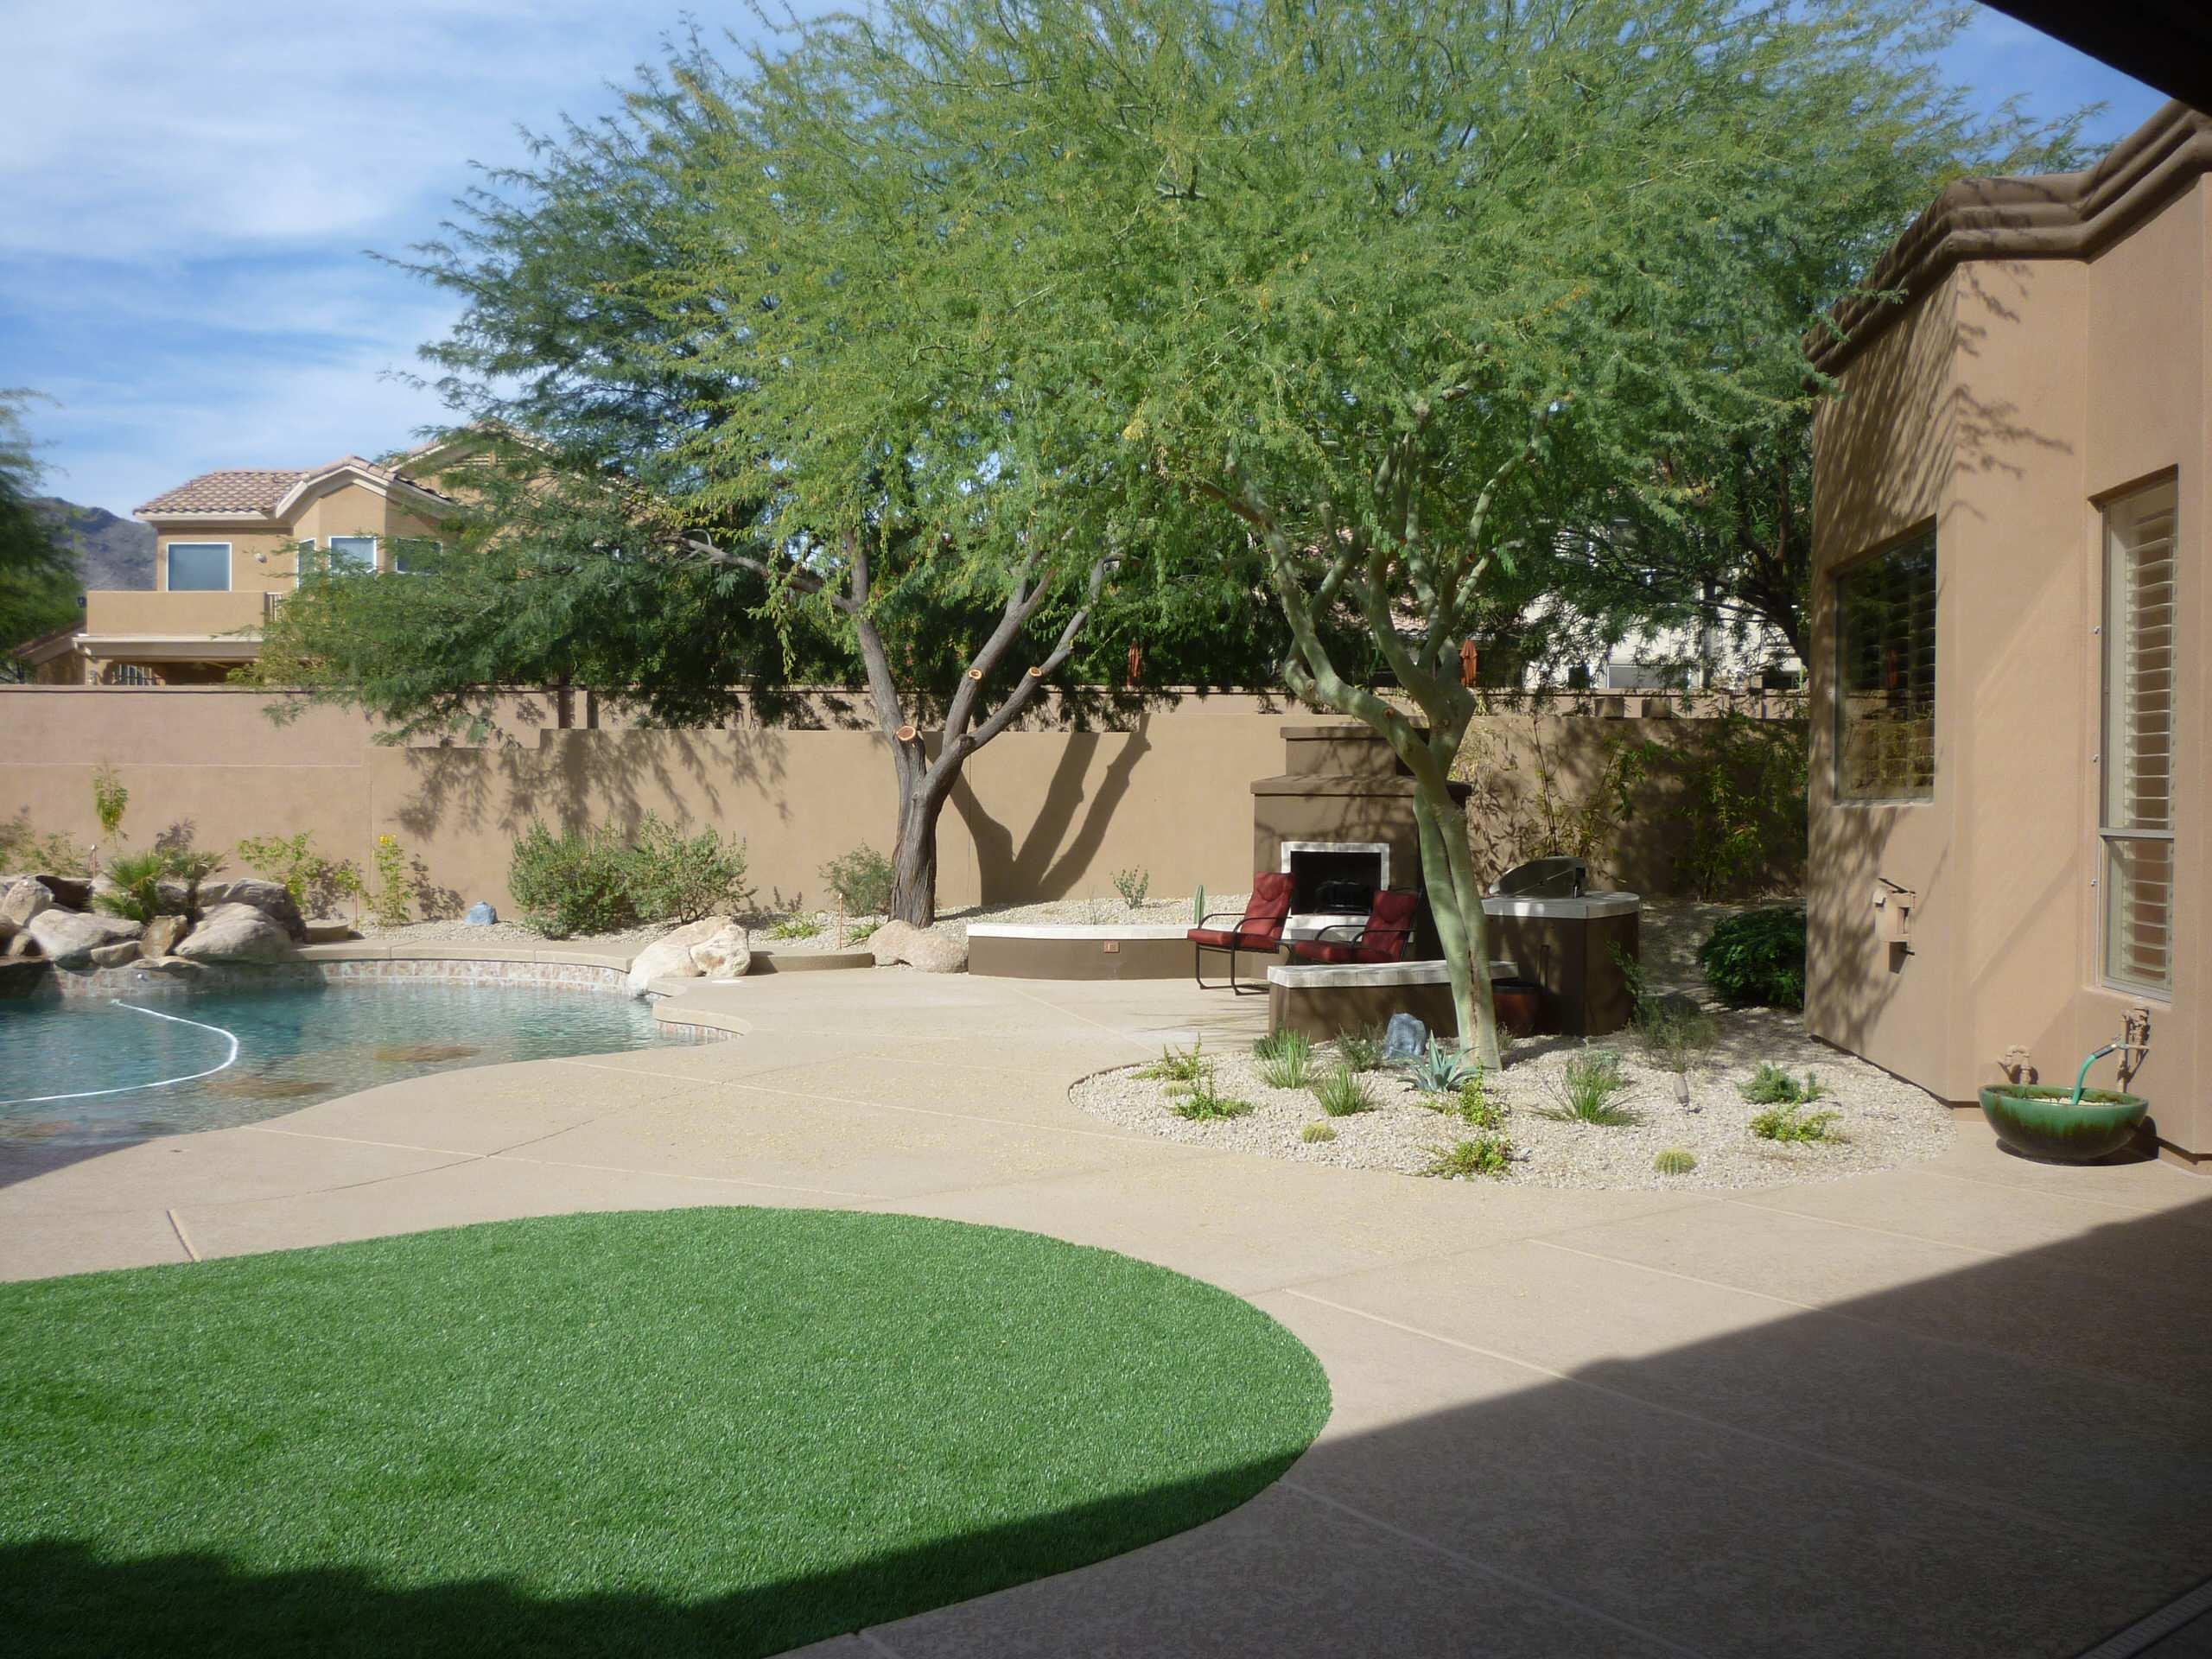 Pool Decking & Seating Area